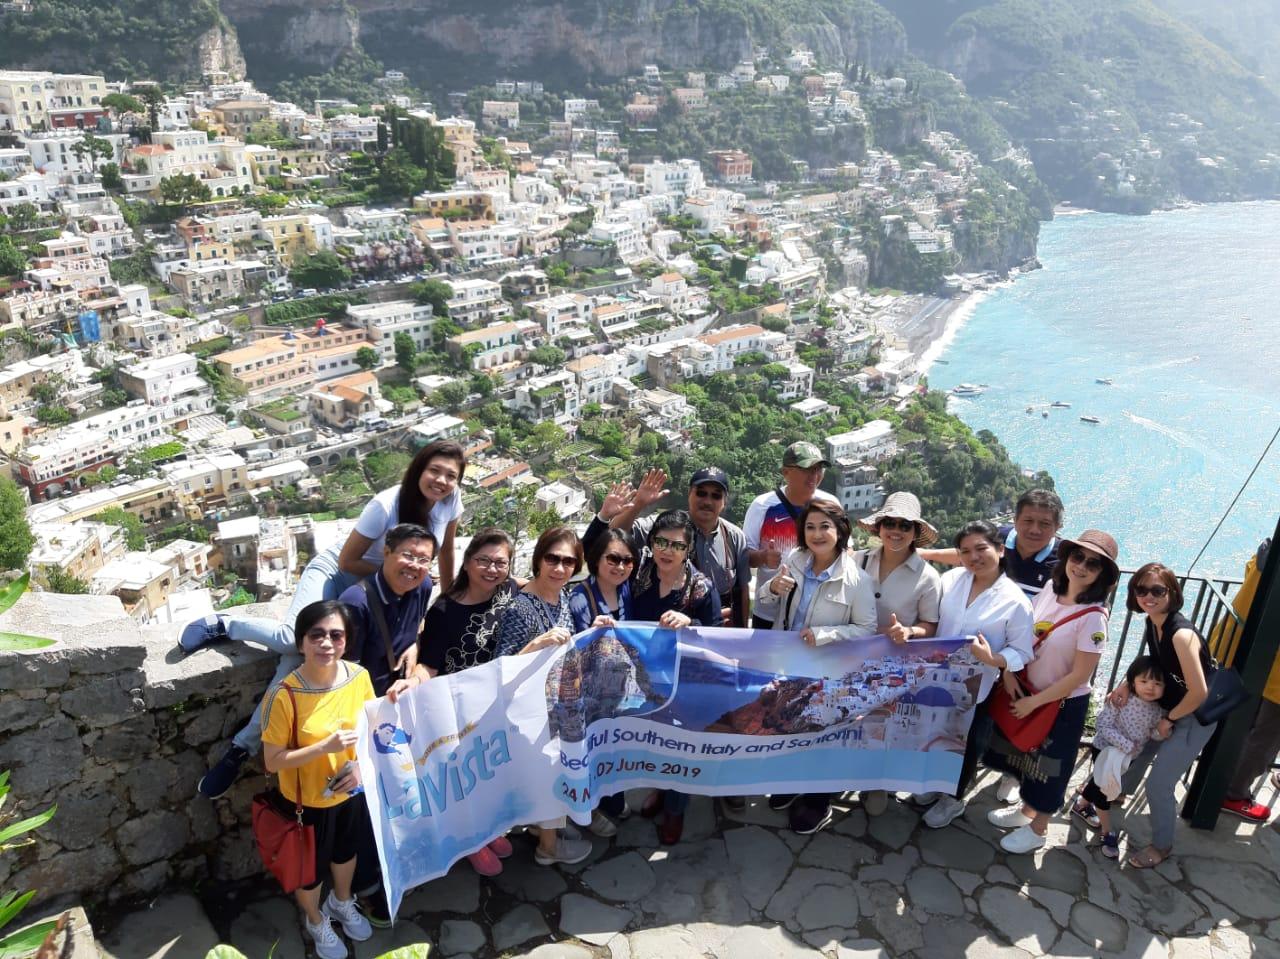 Italy Santorini 24 mei 2019 2